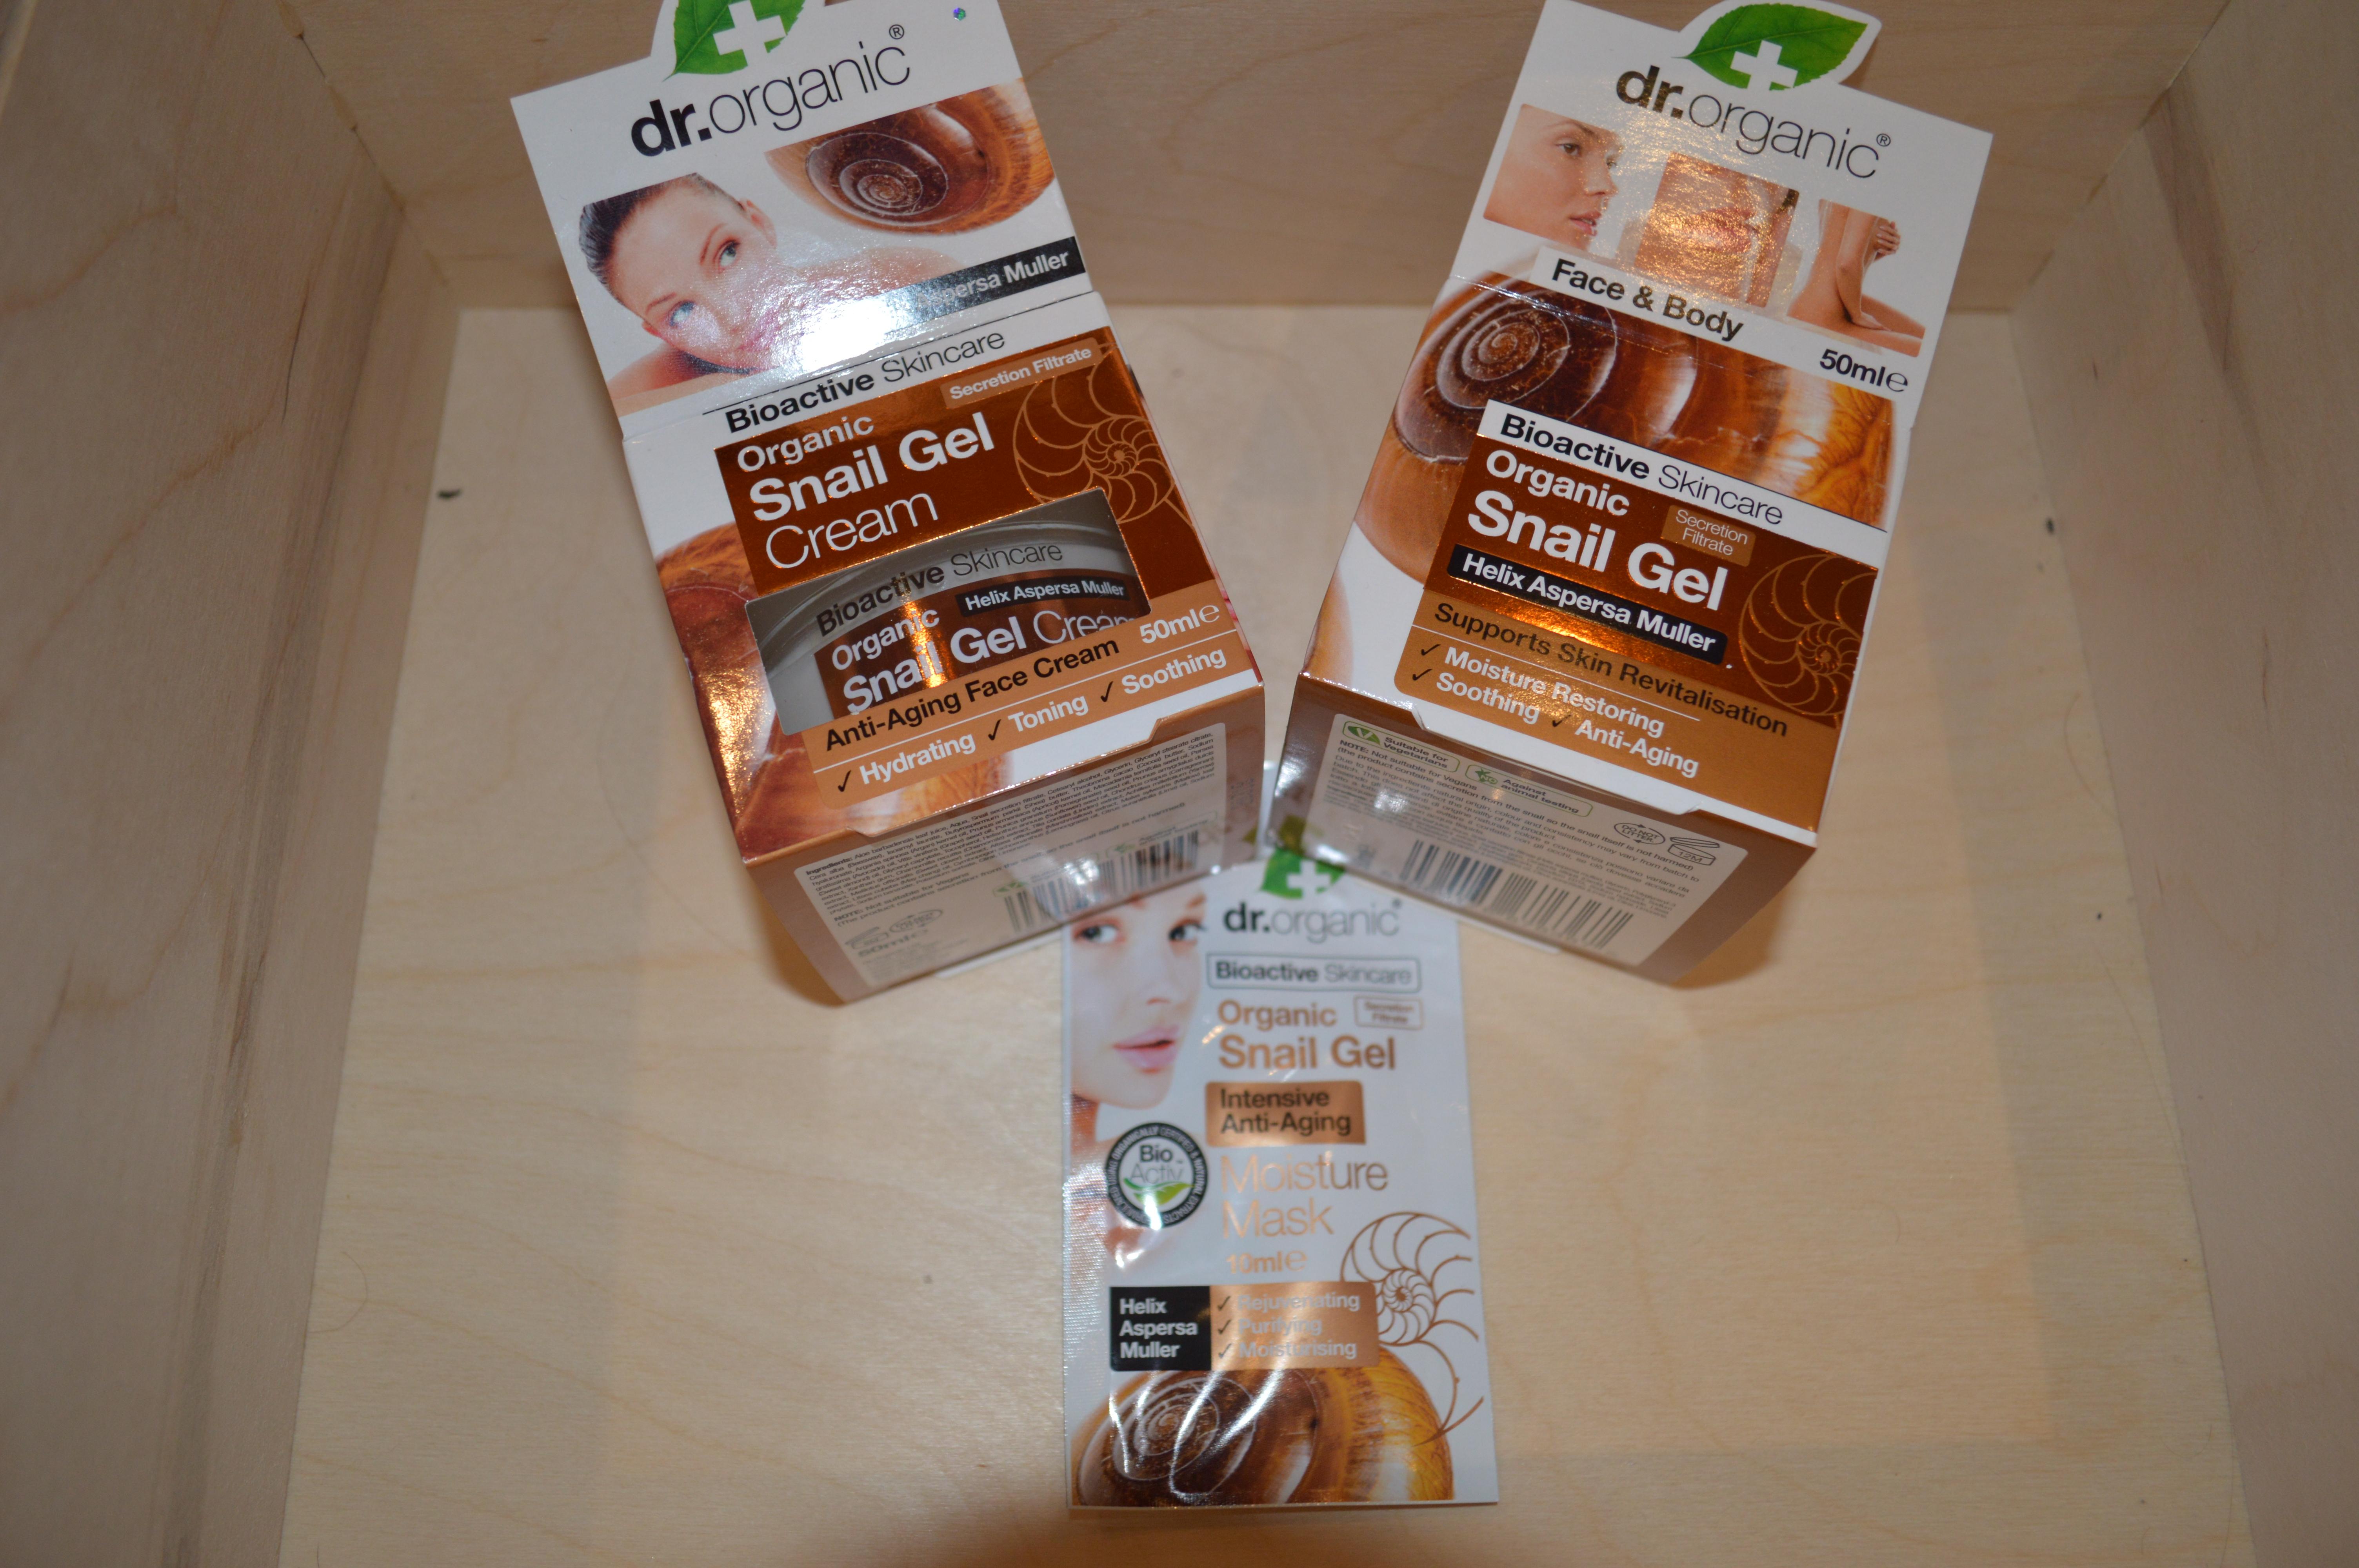 Dr. Organic Skincare Secret Revealed - Products